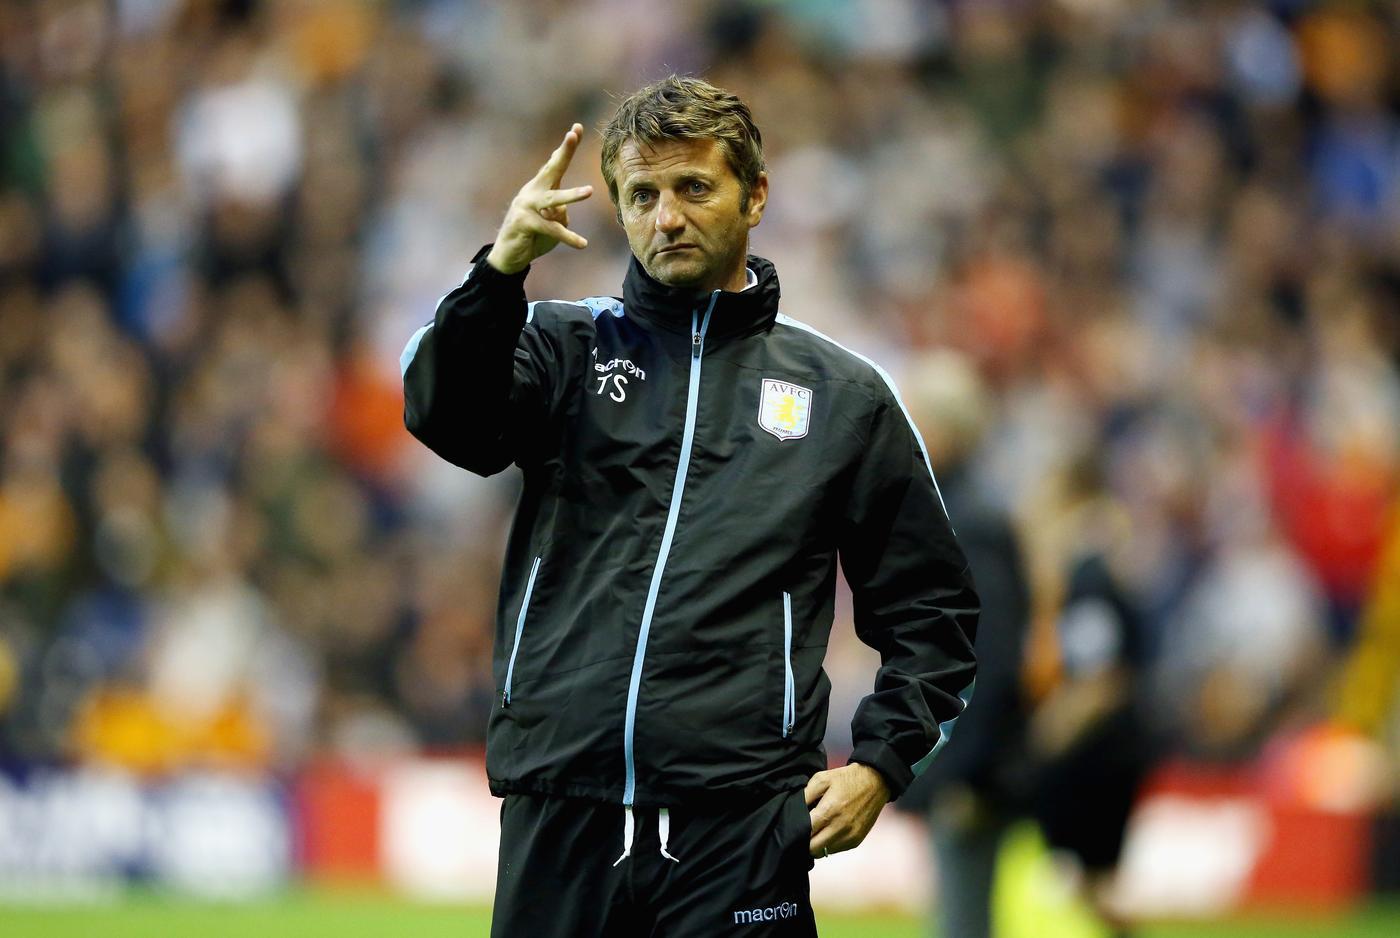 I'm sorry Tim Sherwood, but Aston Villa supporters deserve better than more relegation talk this season